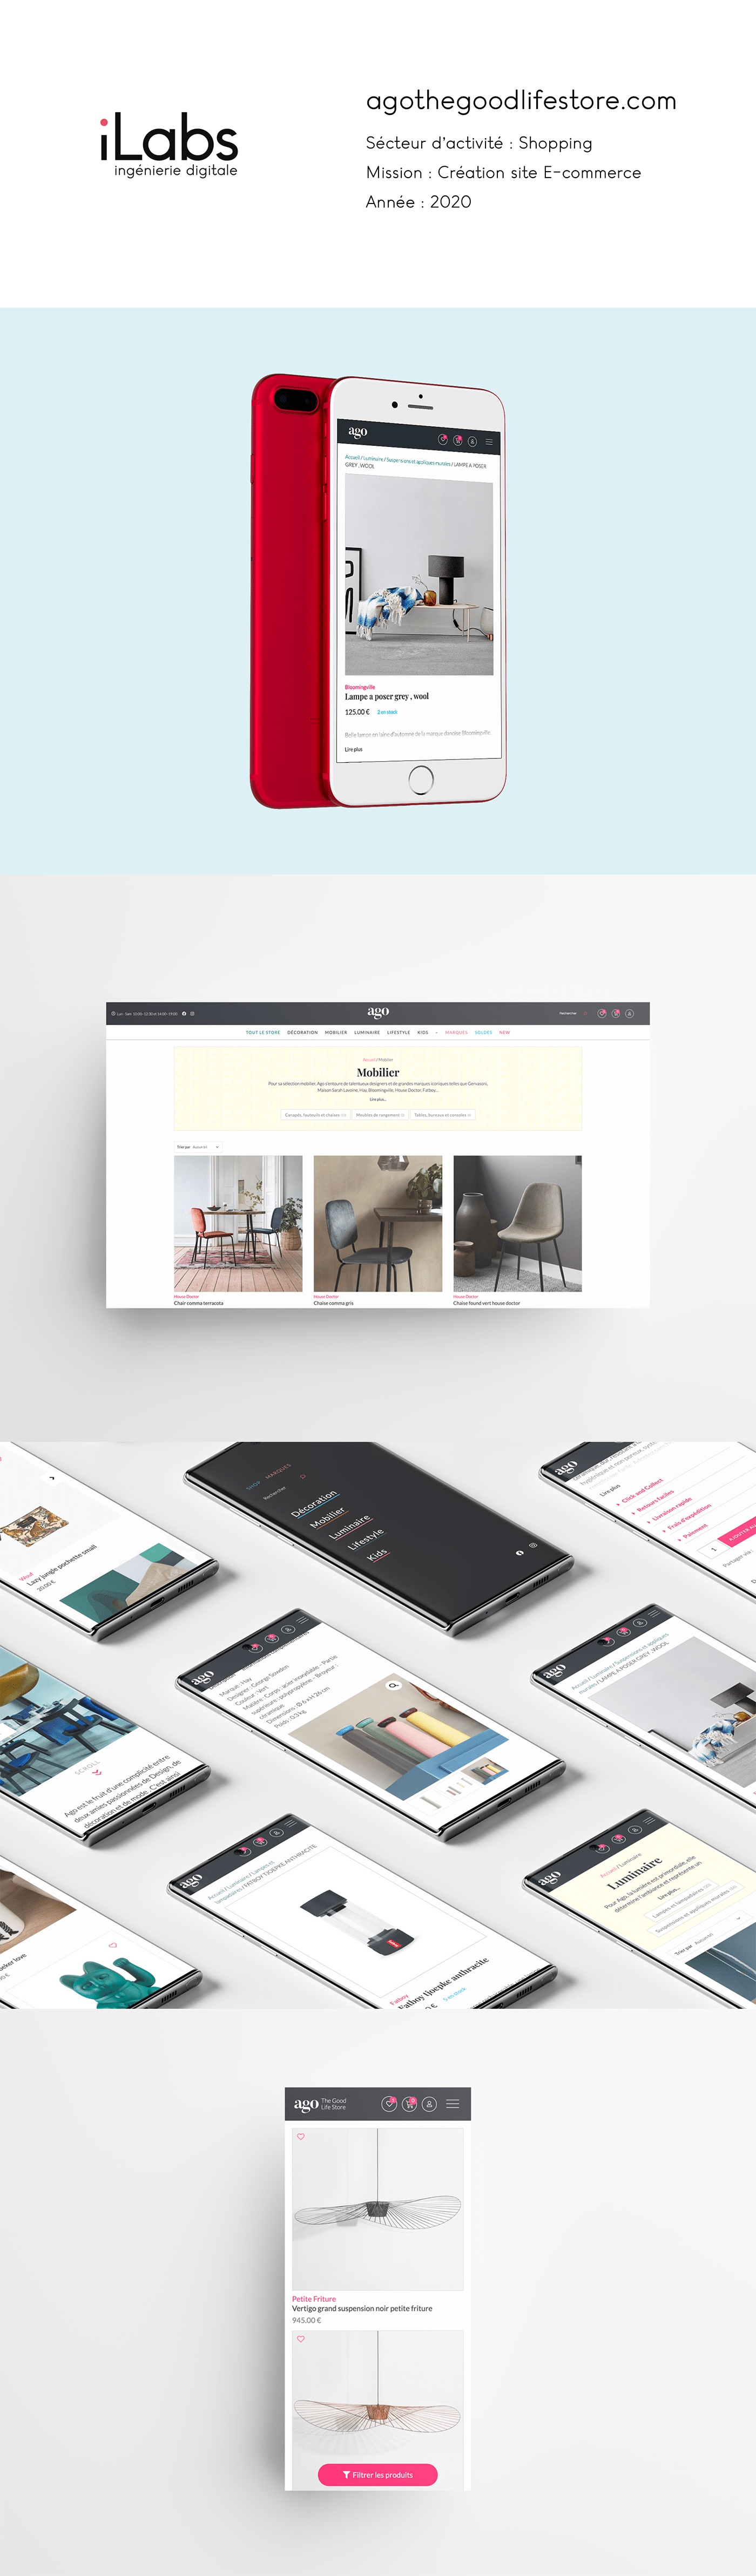 design ui design UX design web site web Web